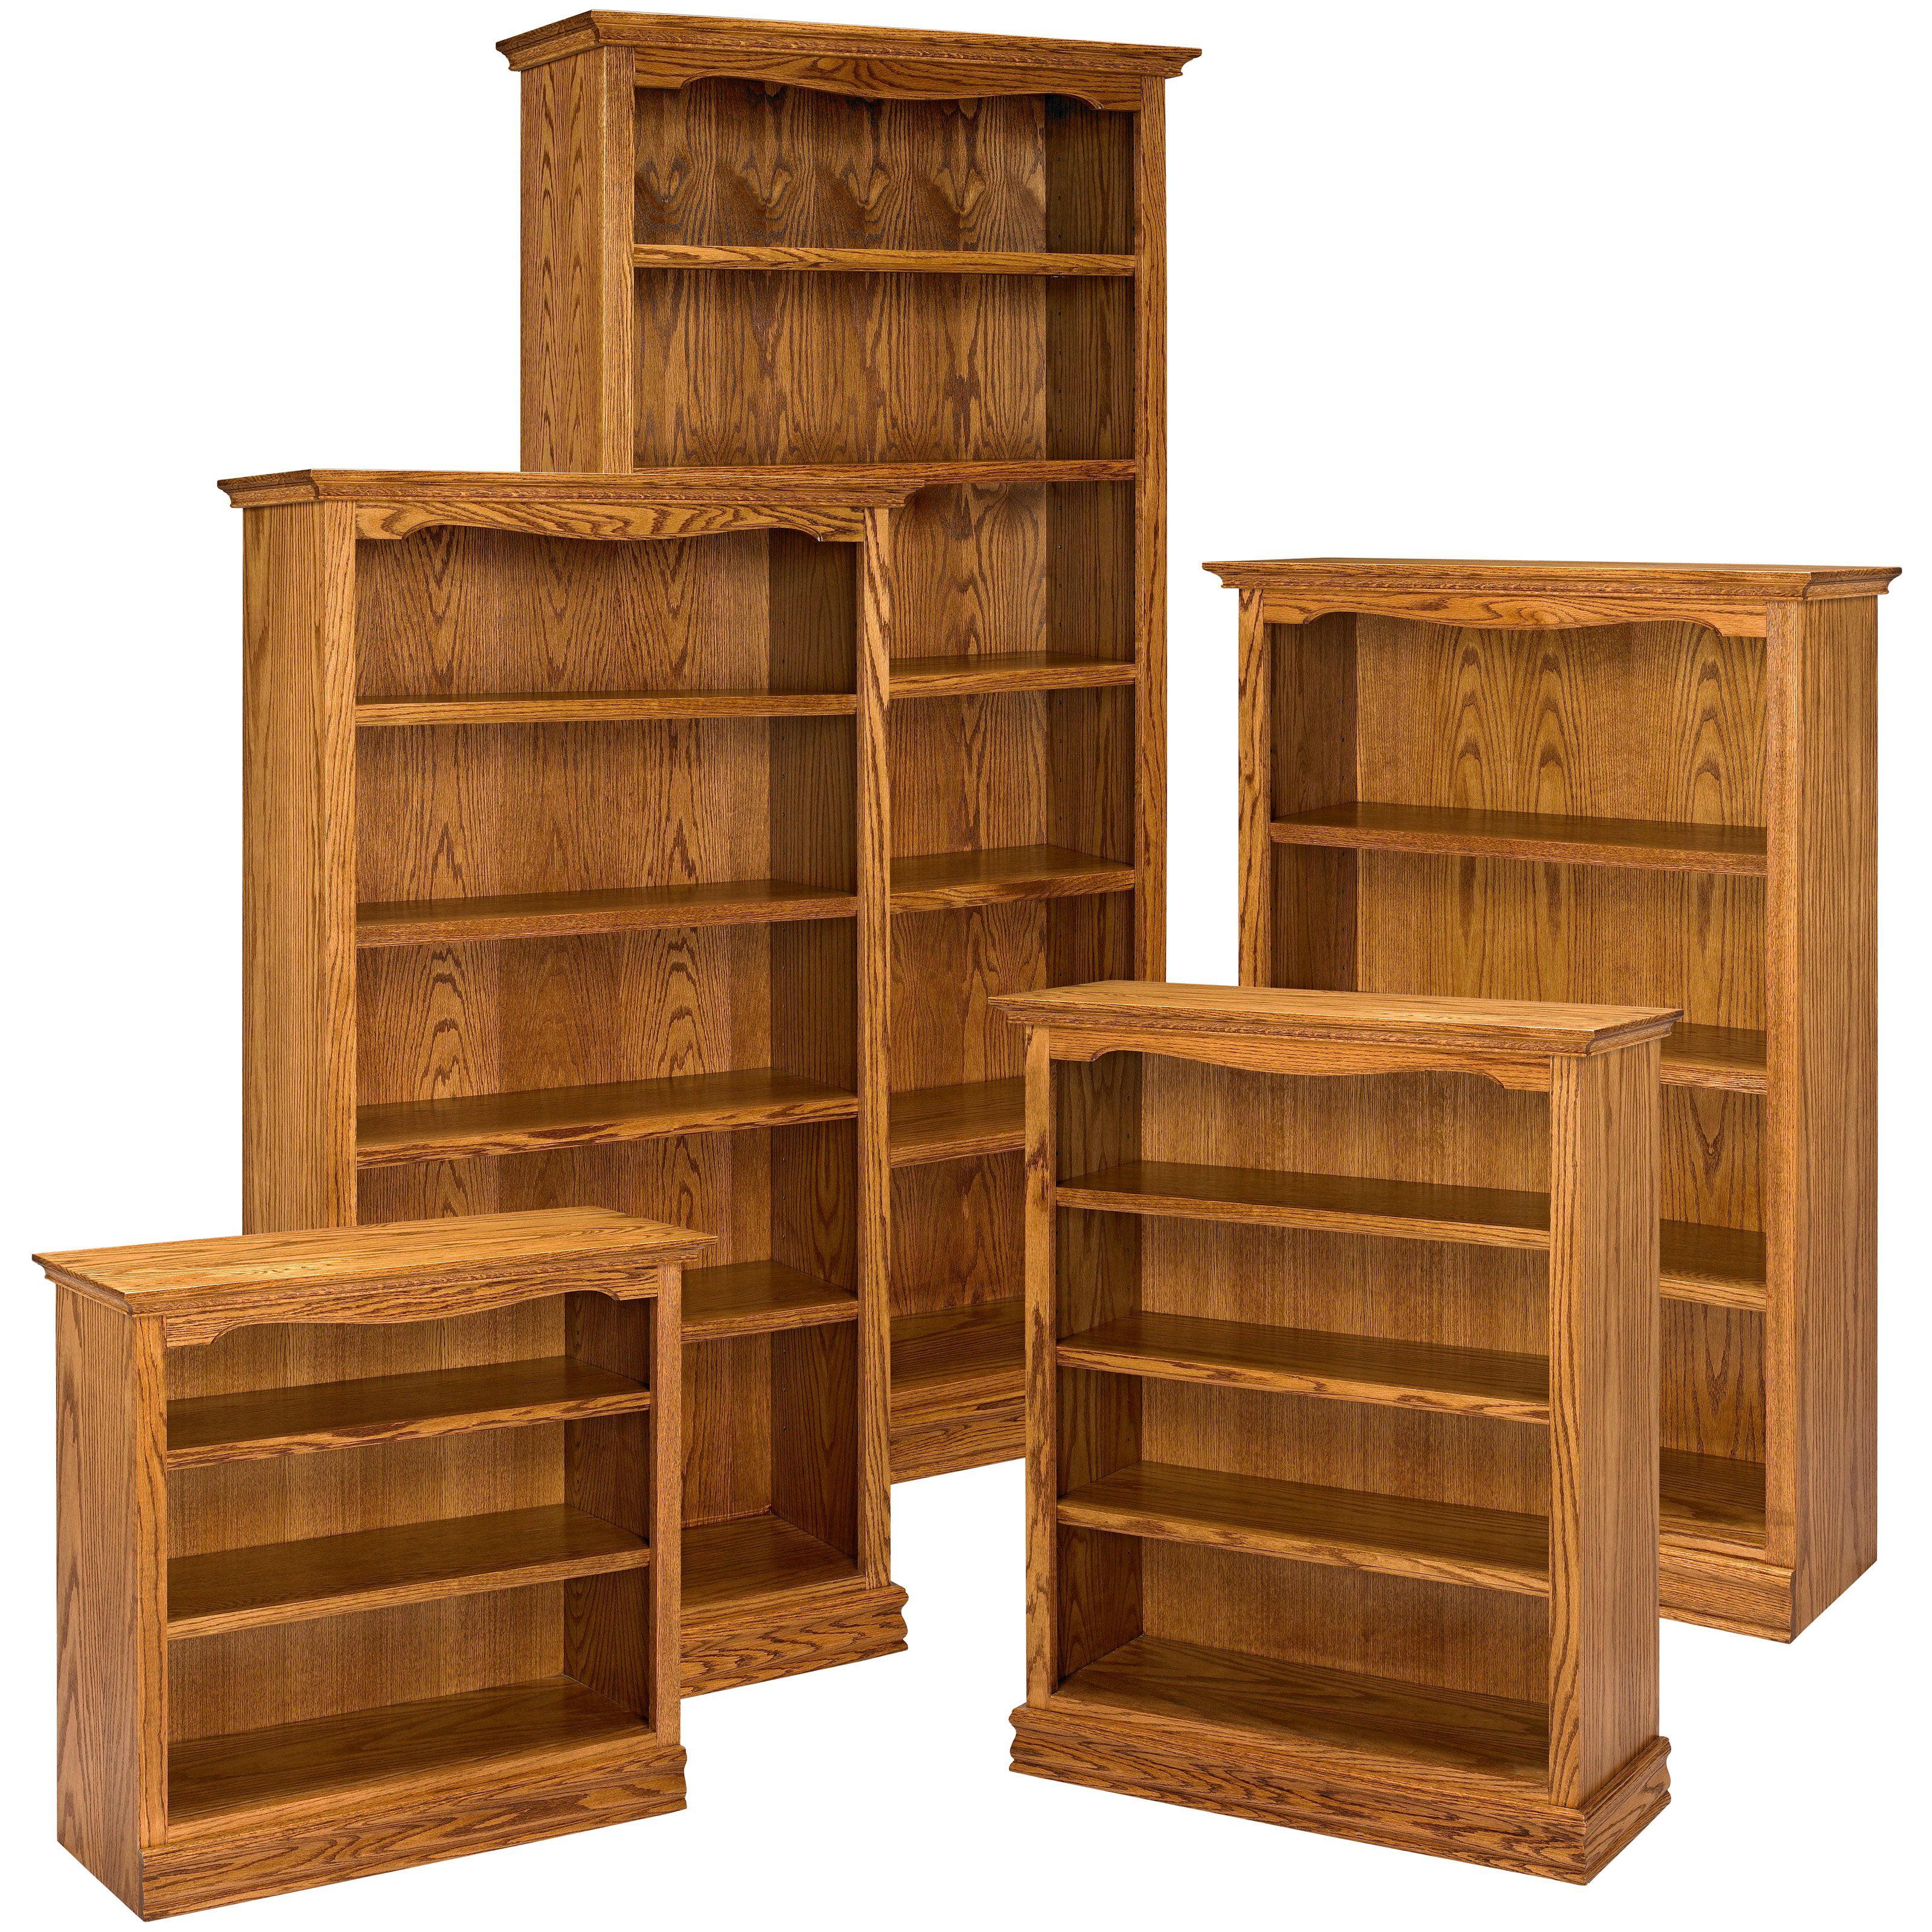 A Amp E Solid Oak Americana Wood Bookcase Walmartcom - Bookshelves at walmart